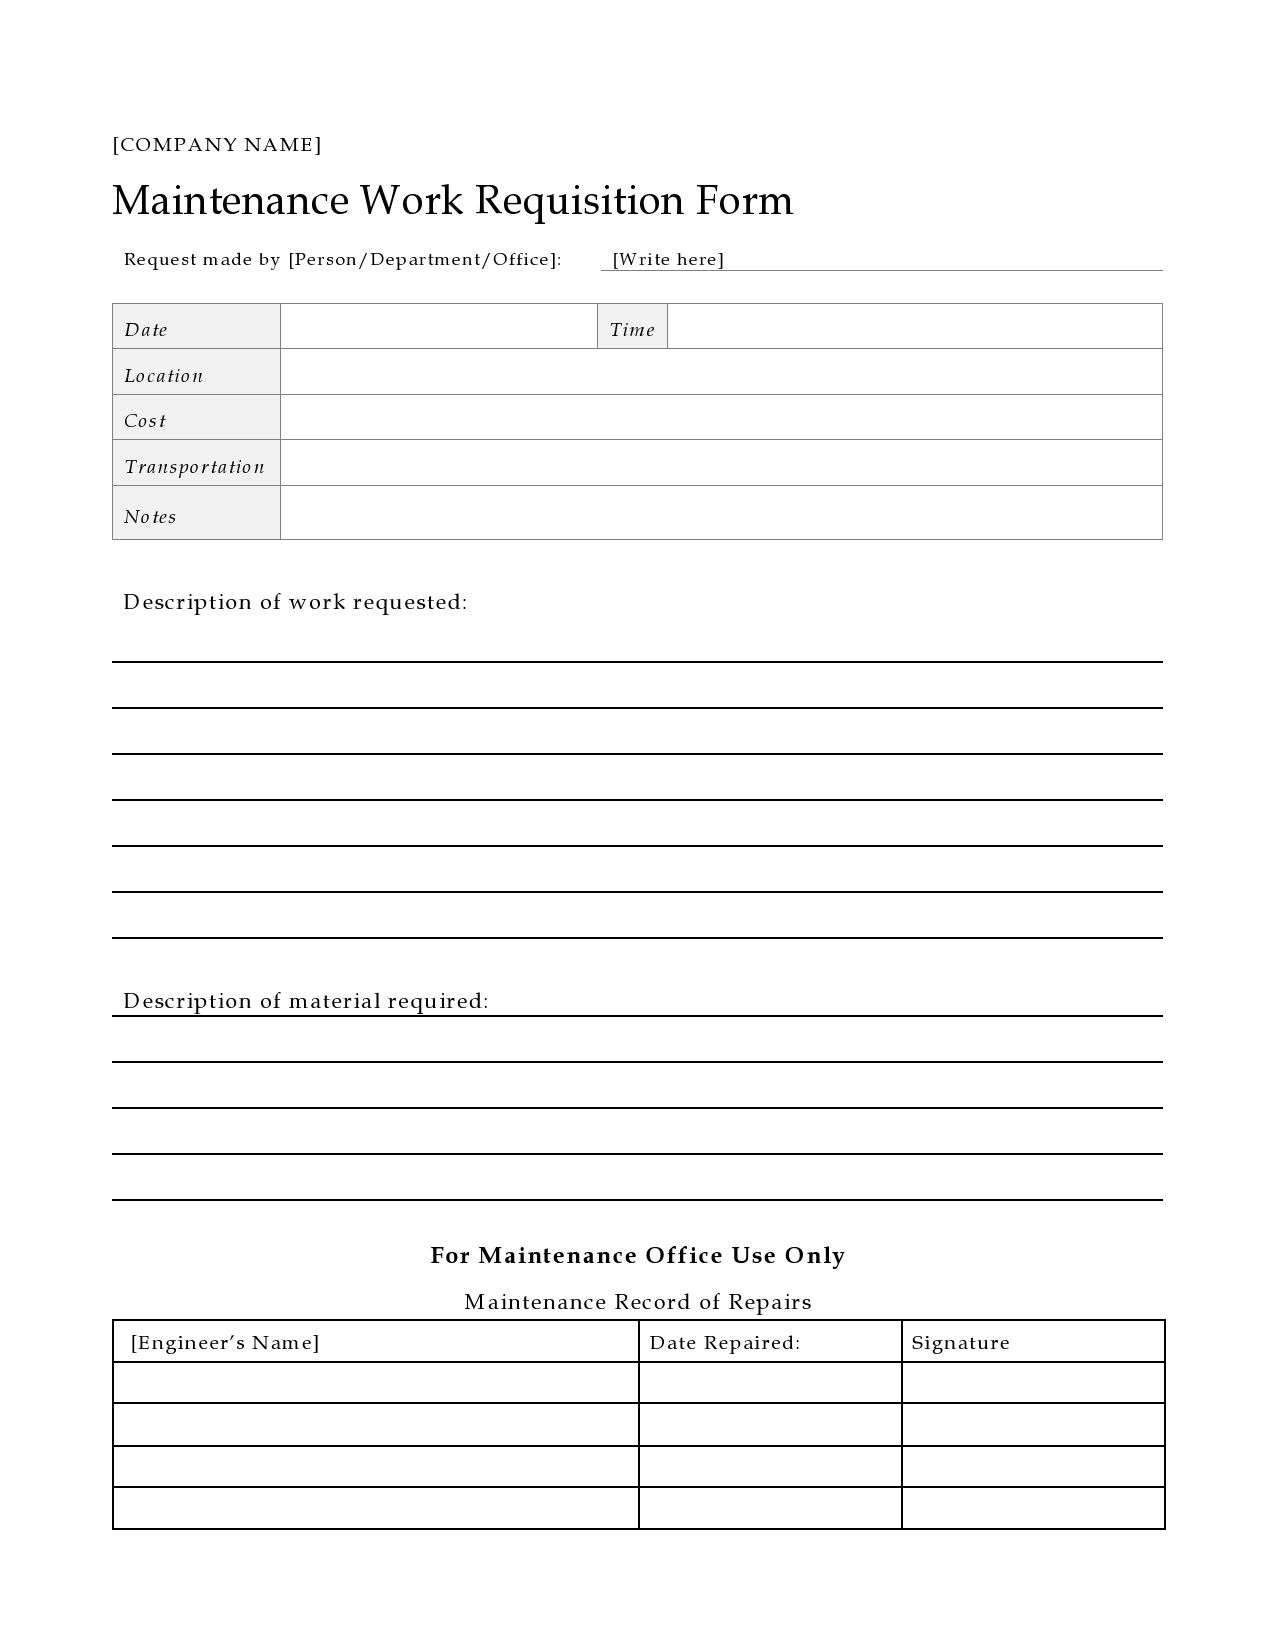 004 Unusual Maintenance Work Order Template Image  Form Free SampleFull